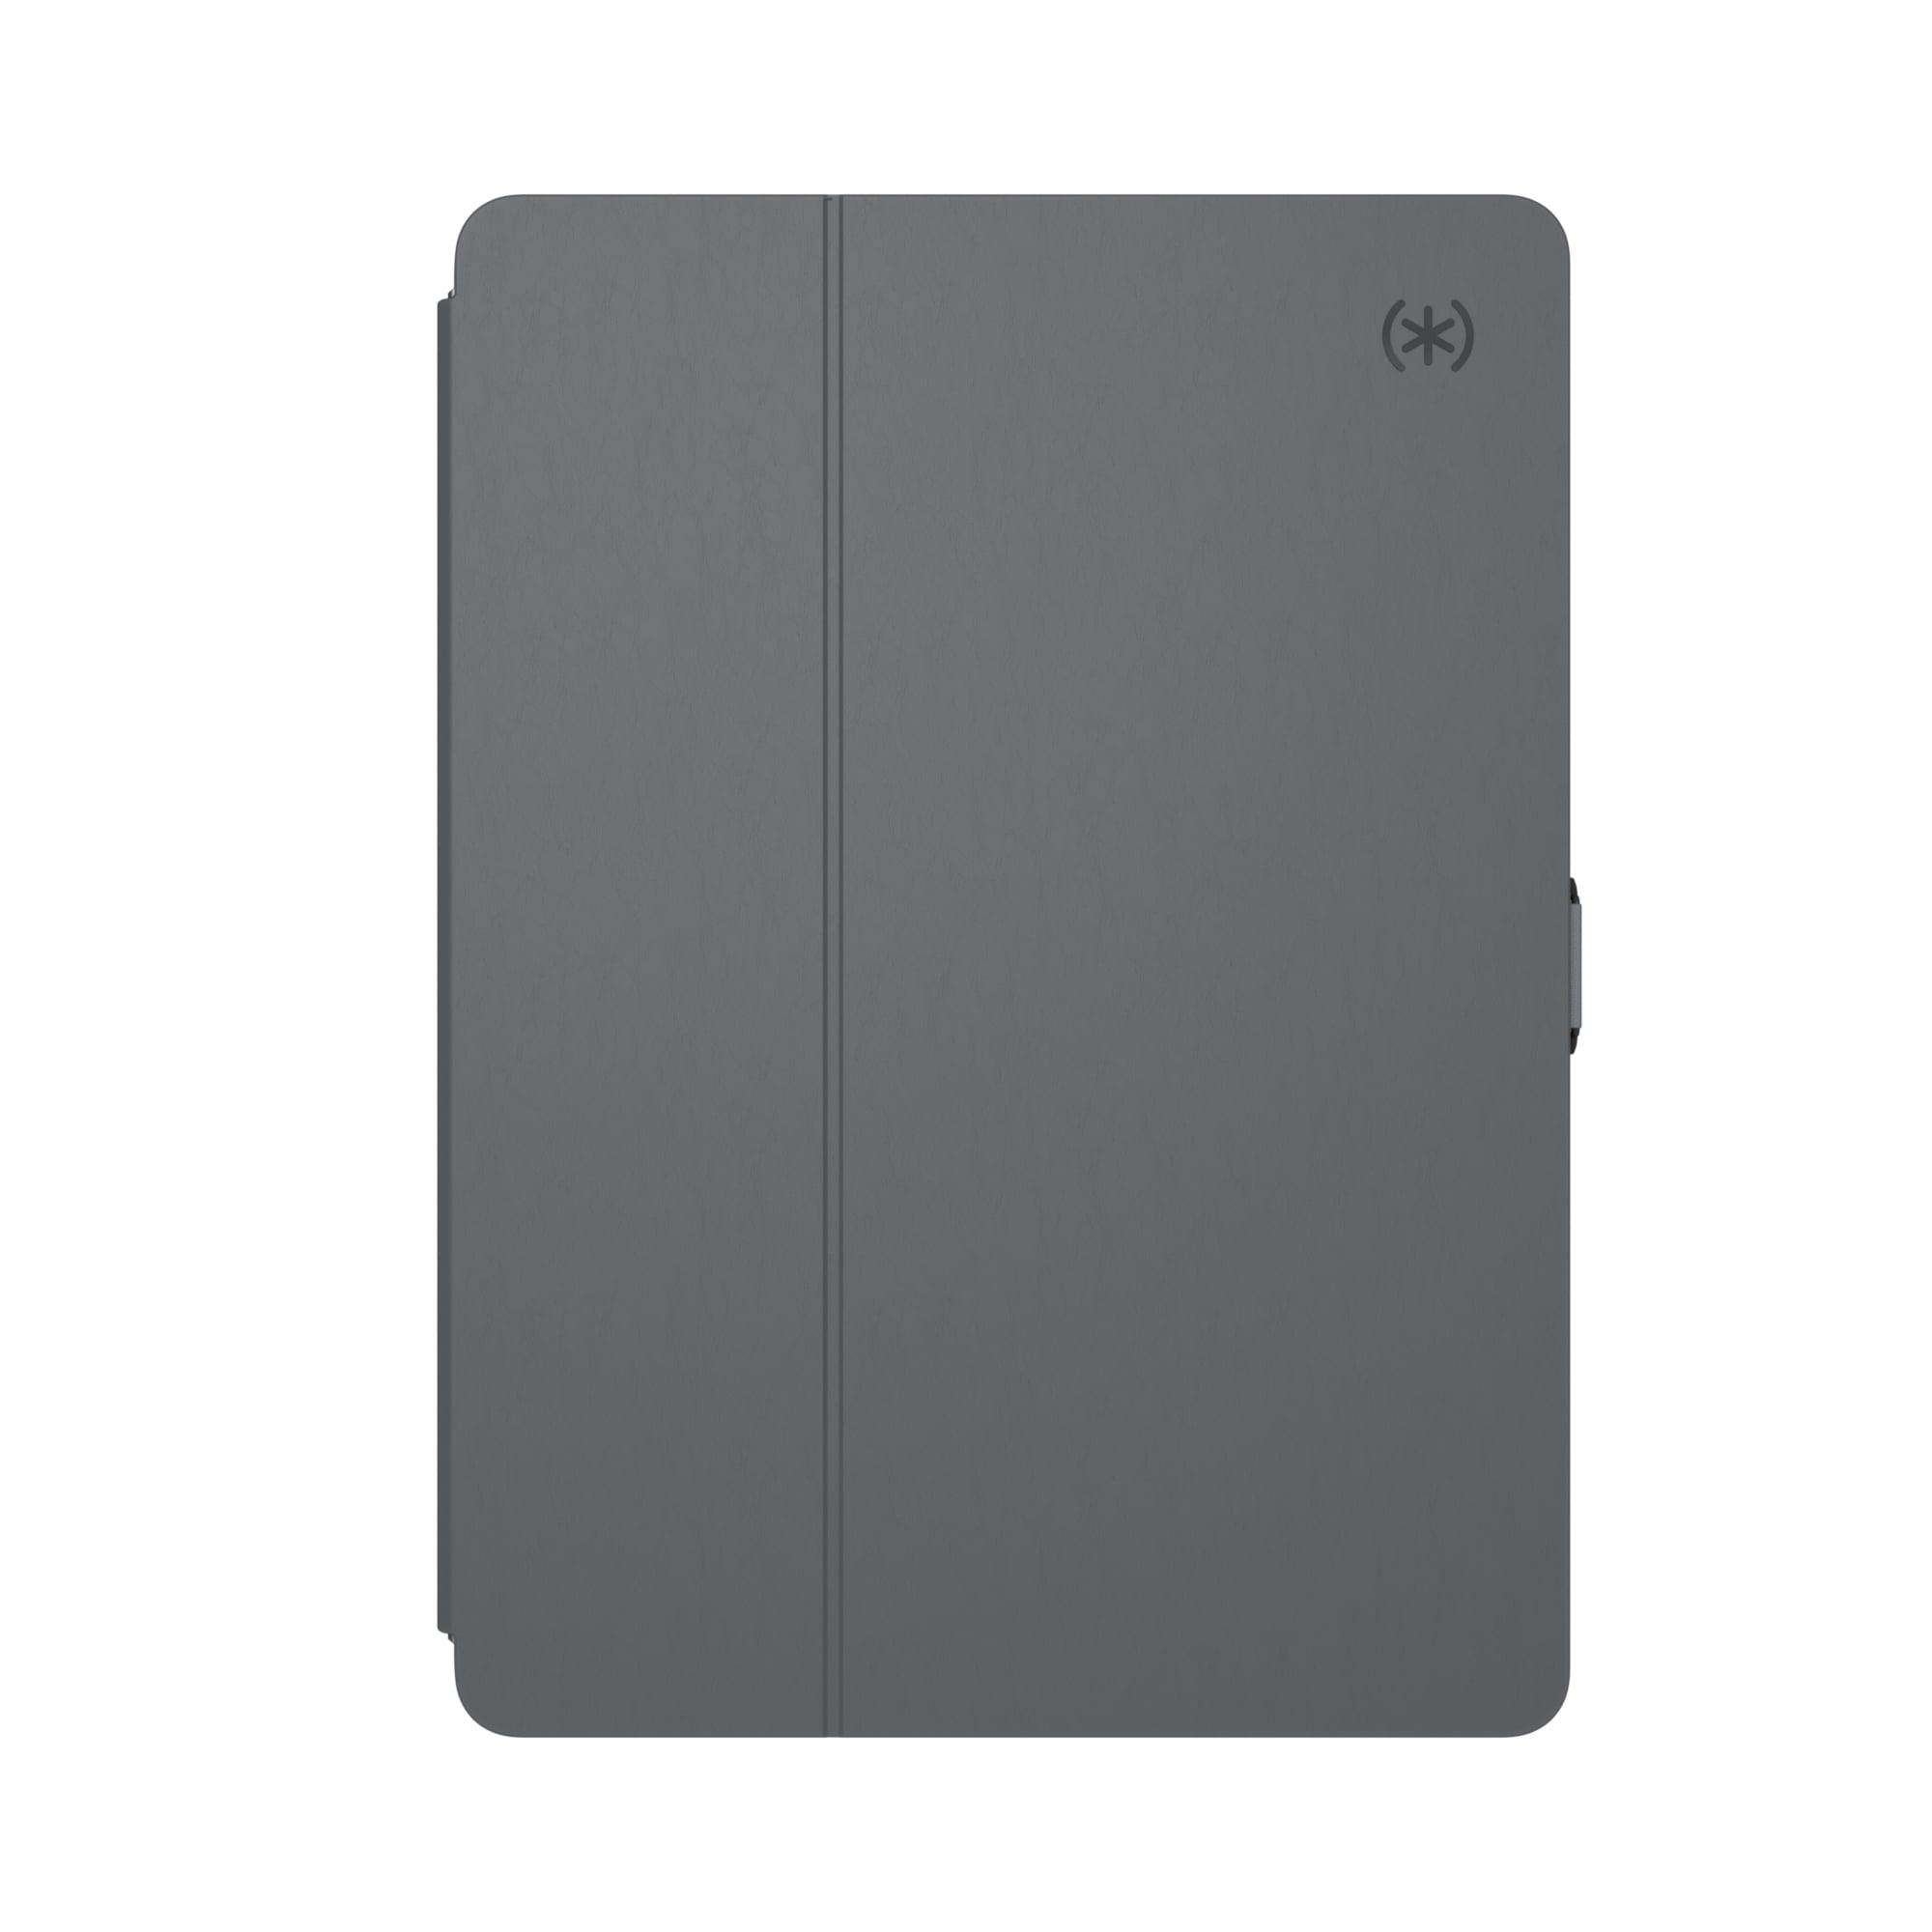 Speck Product 10.5 Ipad Pro Stylefolio Grey